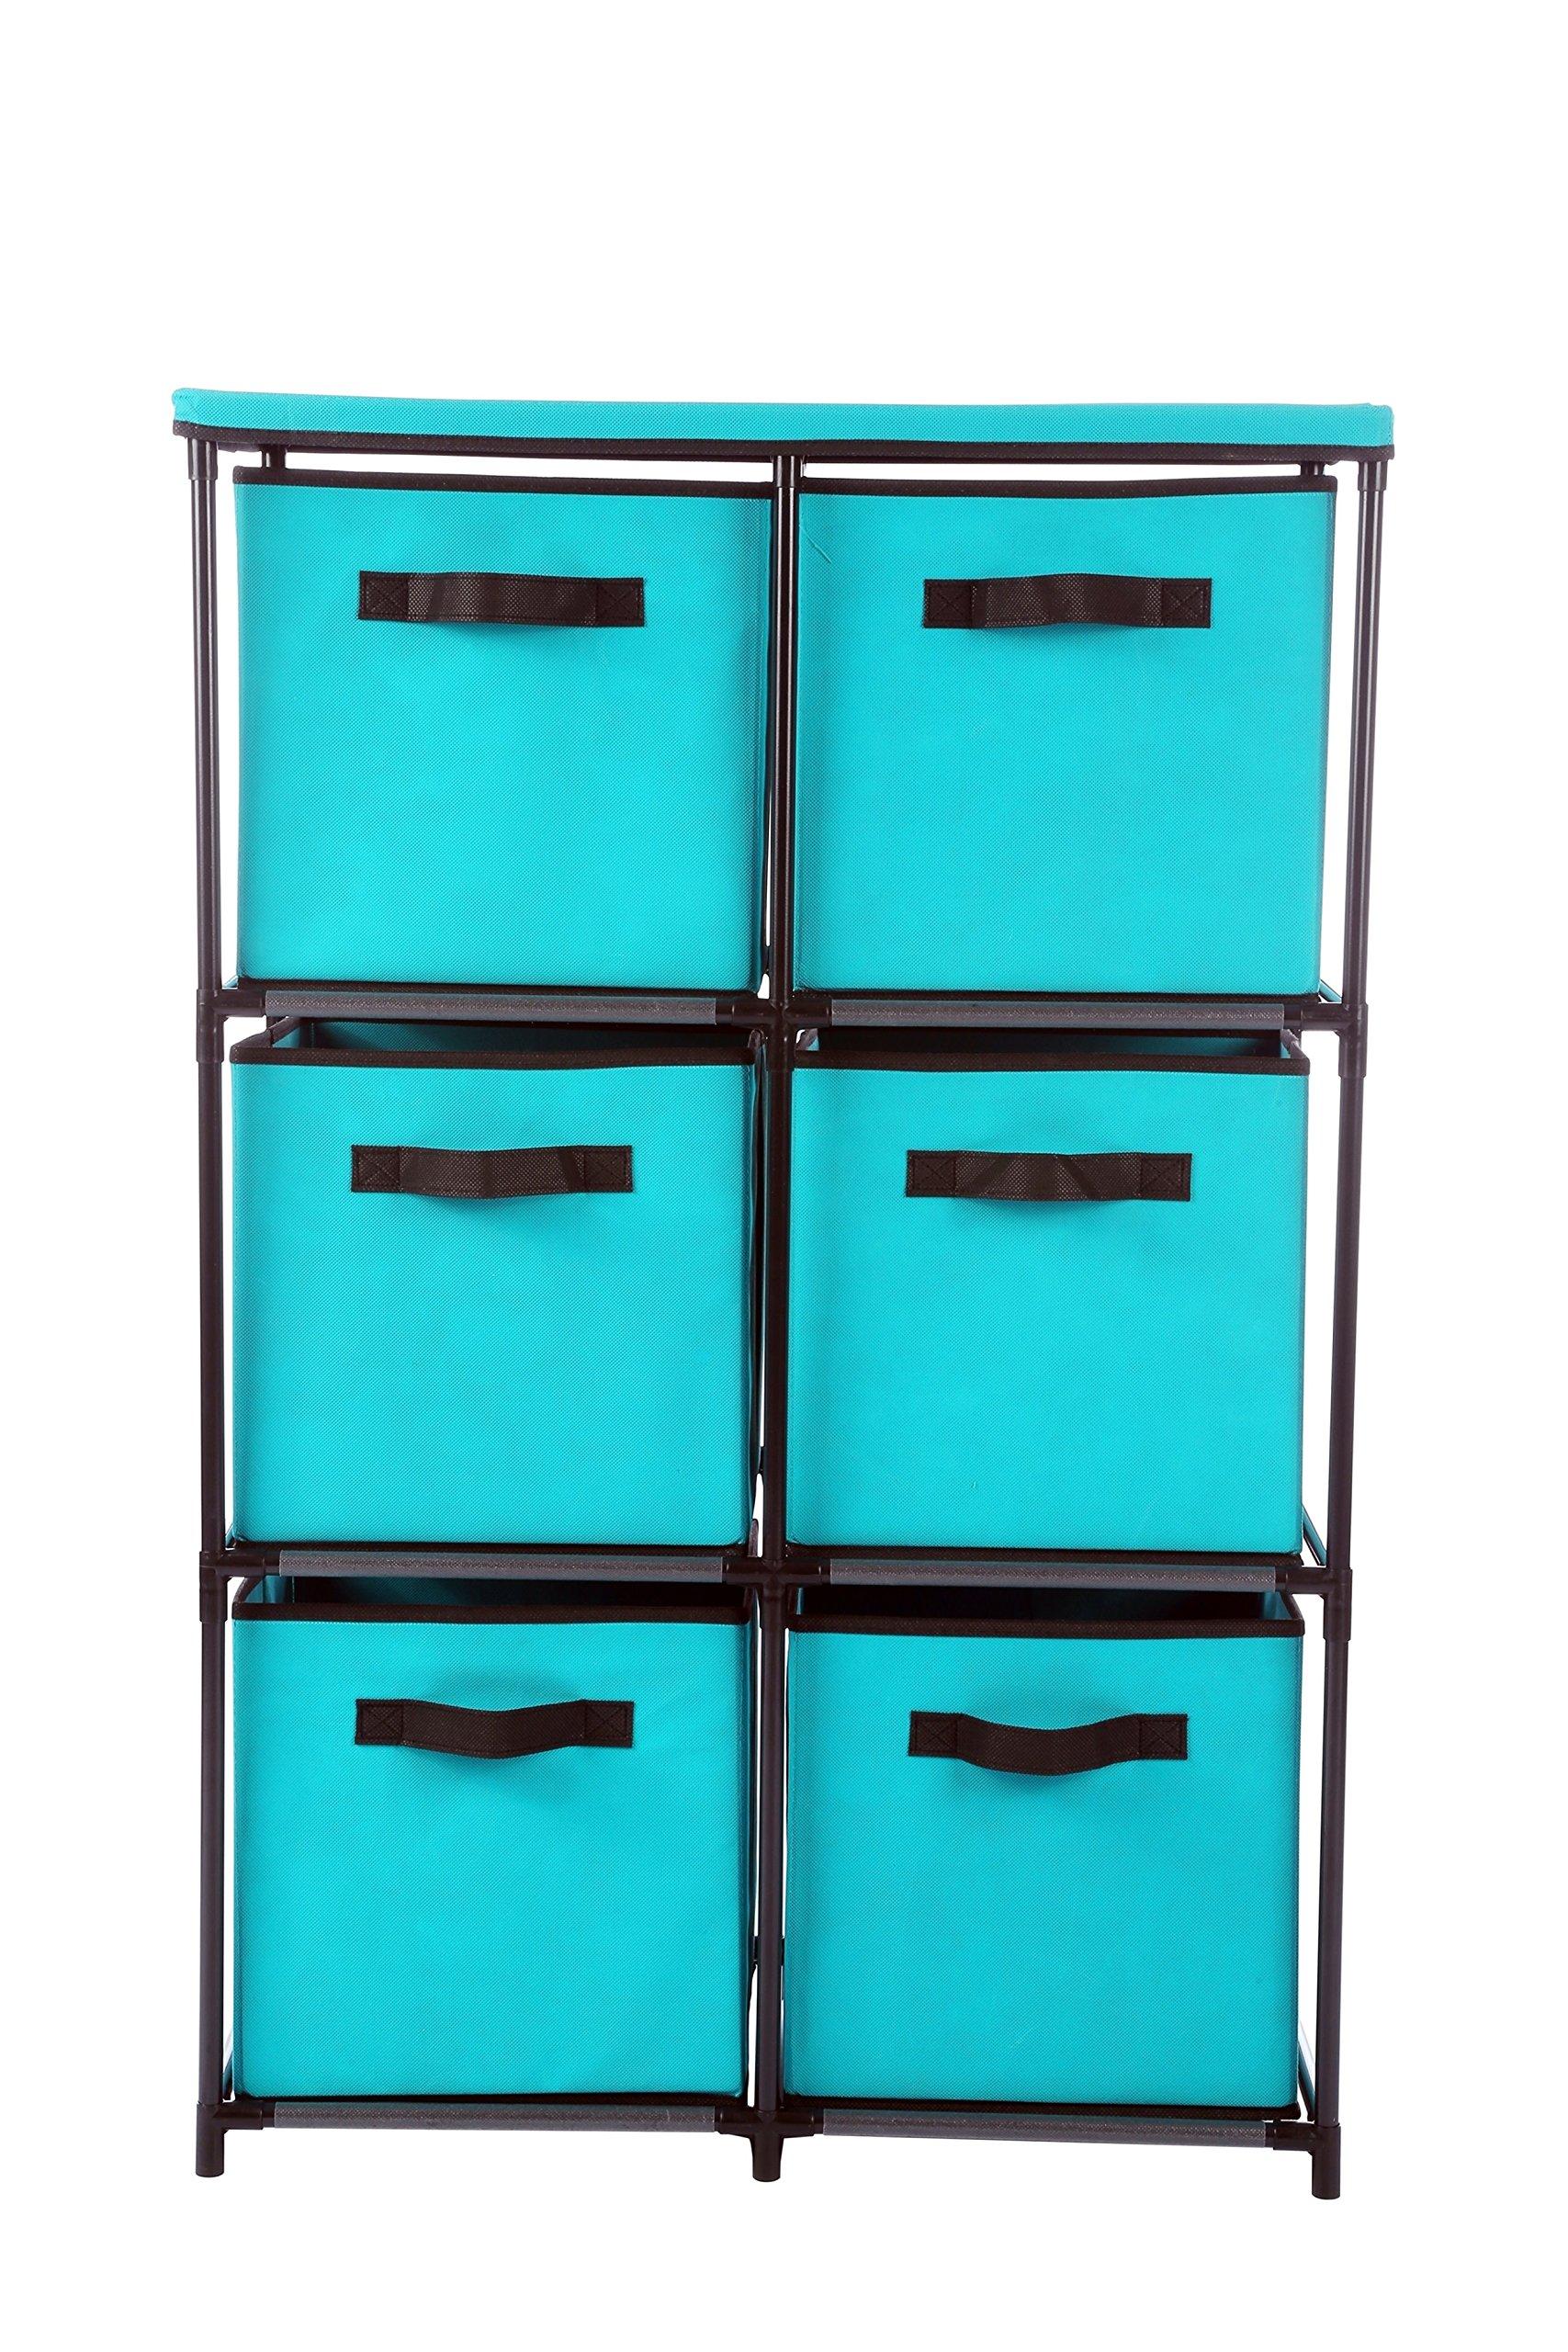 Homebi 6-Drawer Storage Chest Shelf Unit Storage Cabinet Multi-Bin Organizer with Removable Non-woven Fabric Bins in Turquoise,25''W x 13.2''D x38.0''H